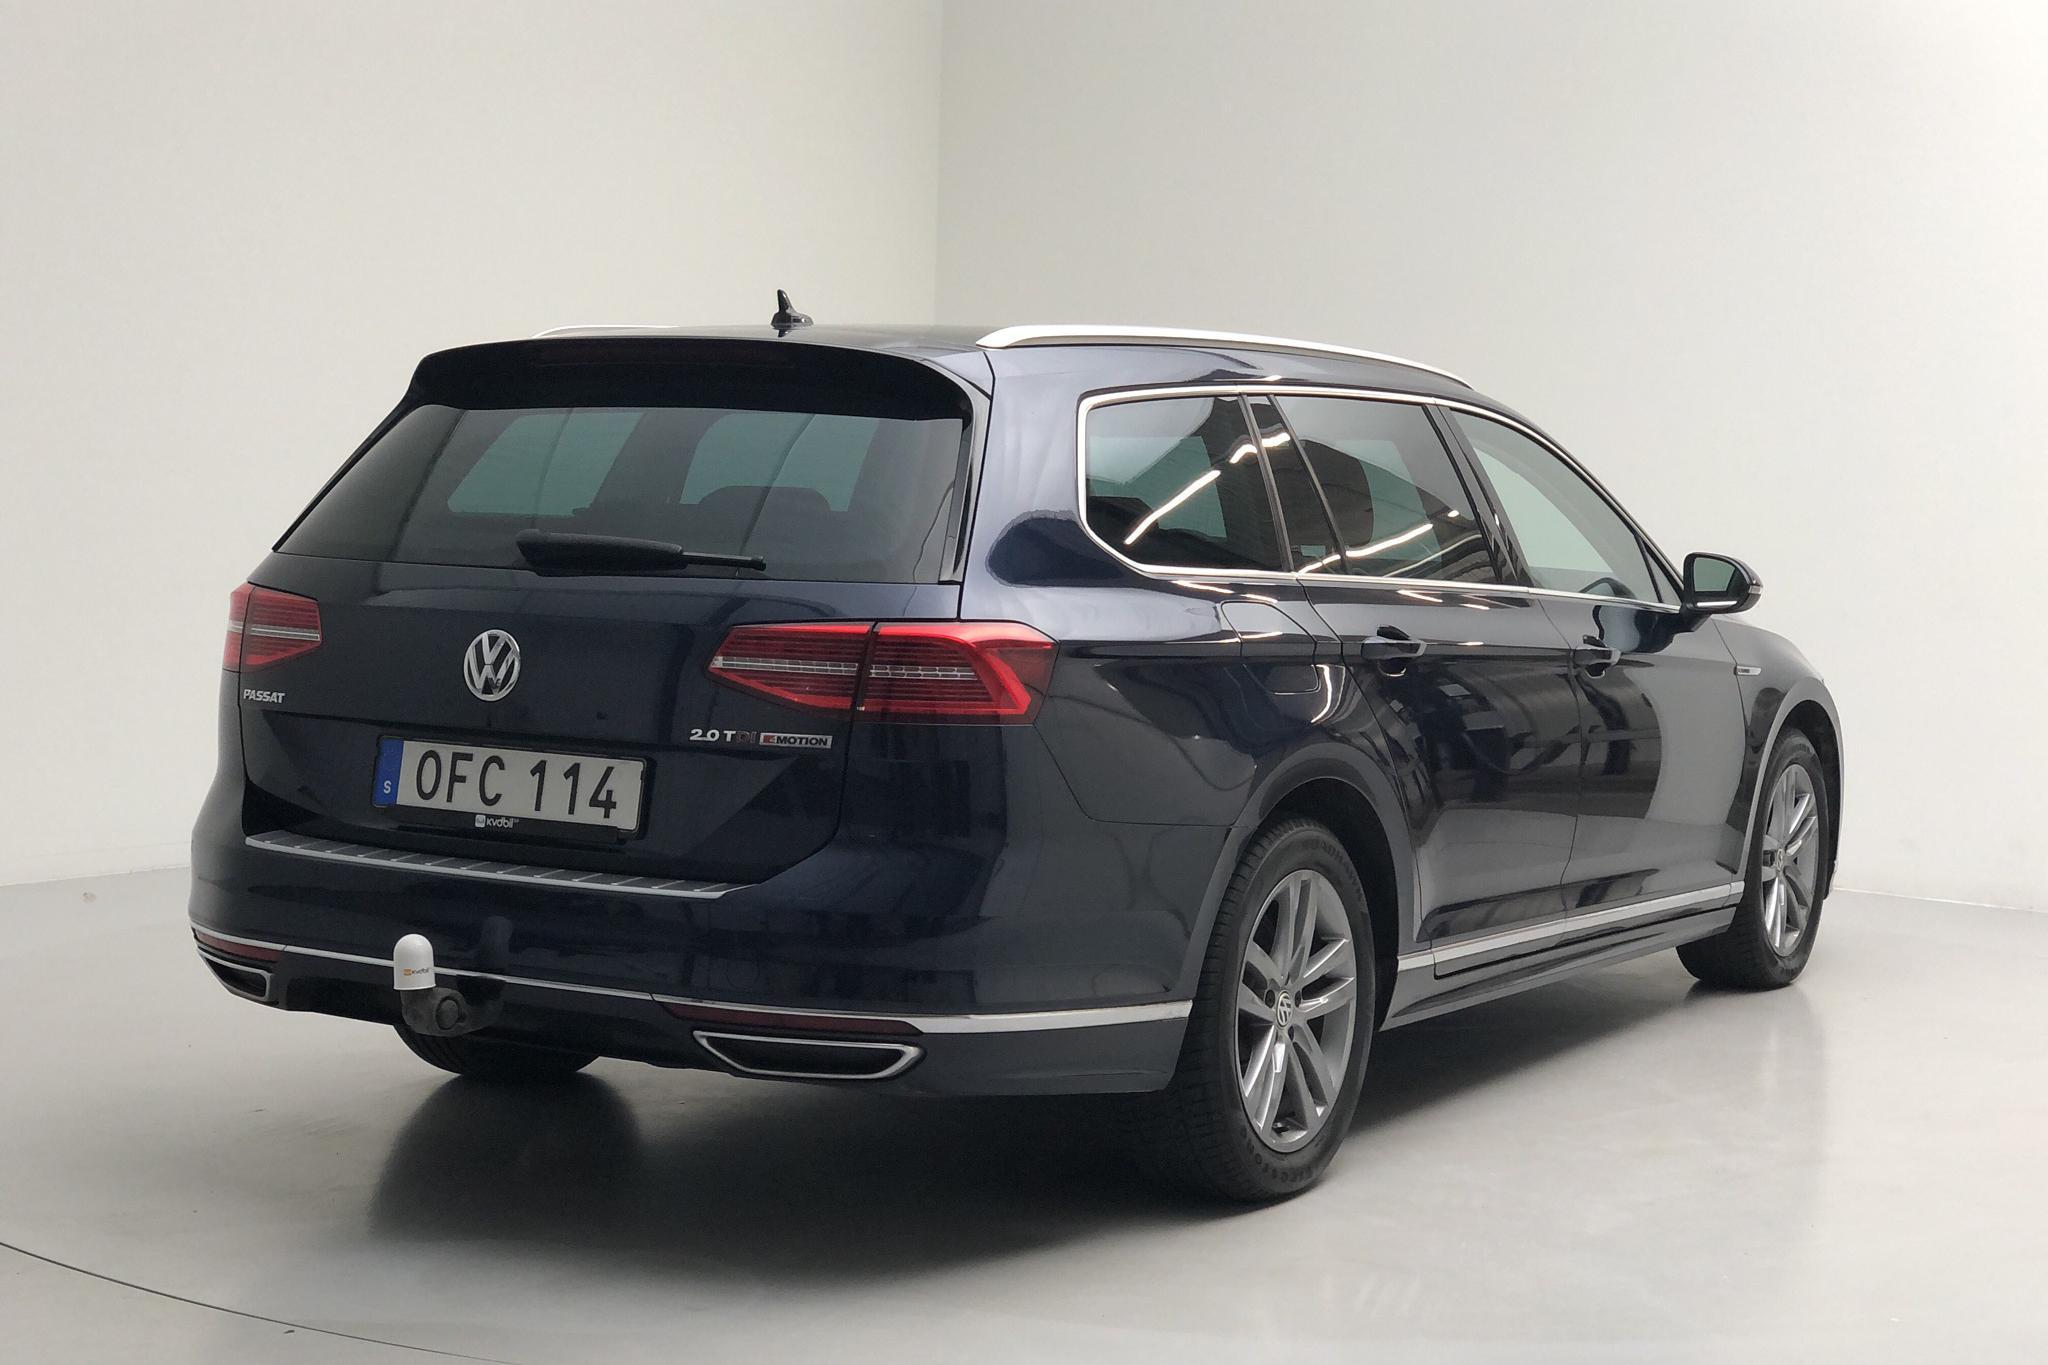 VW Passat 2.0 TDI Sportscombi 4MOTION (190hk) - 9 853 mil - Automat - Dark Blue - 2017